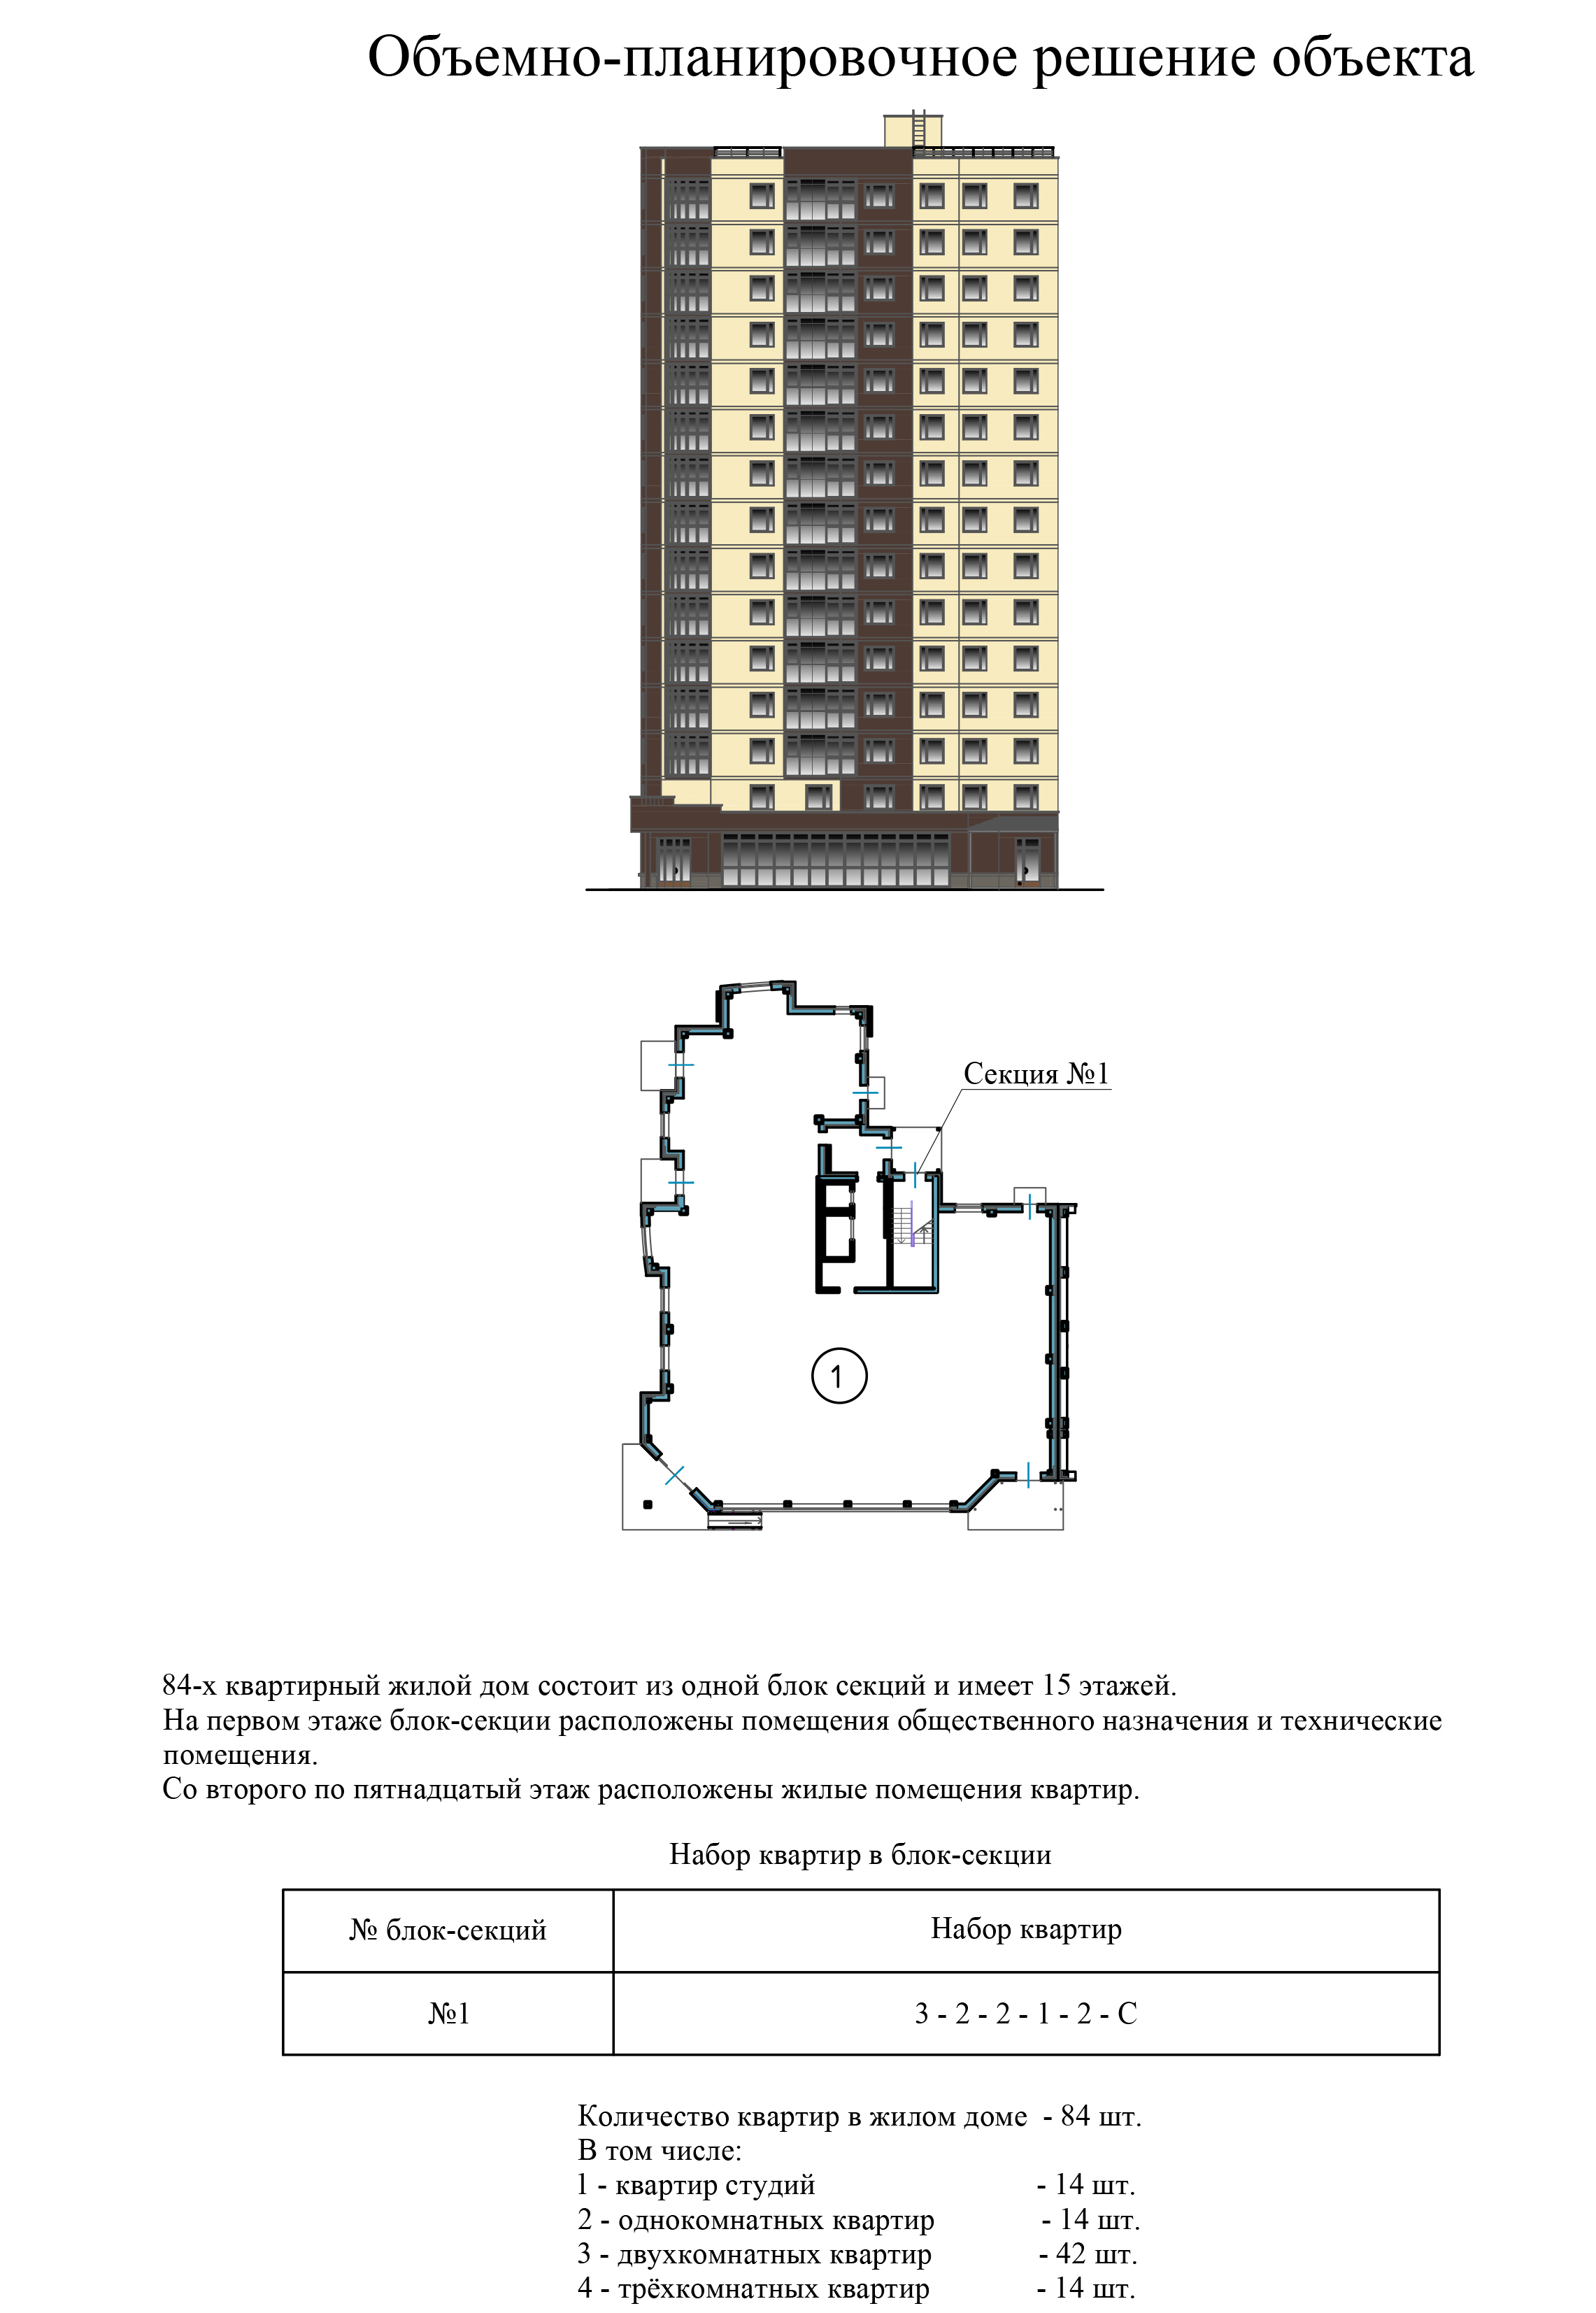 Однокомнатная квартира - ул.Балтийская, д. 1а, кв. 40